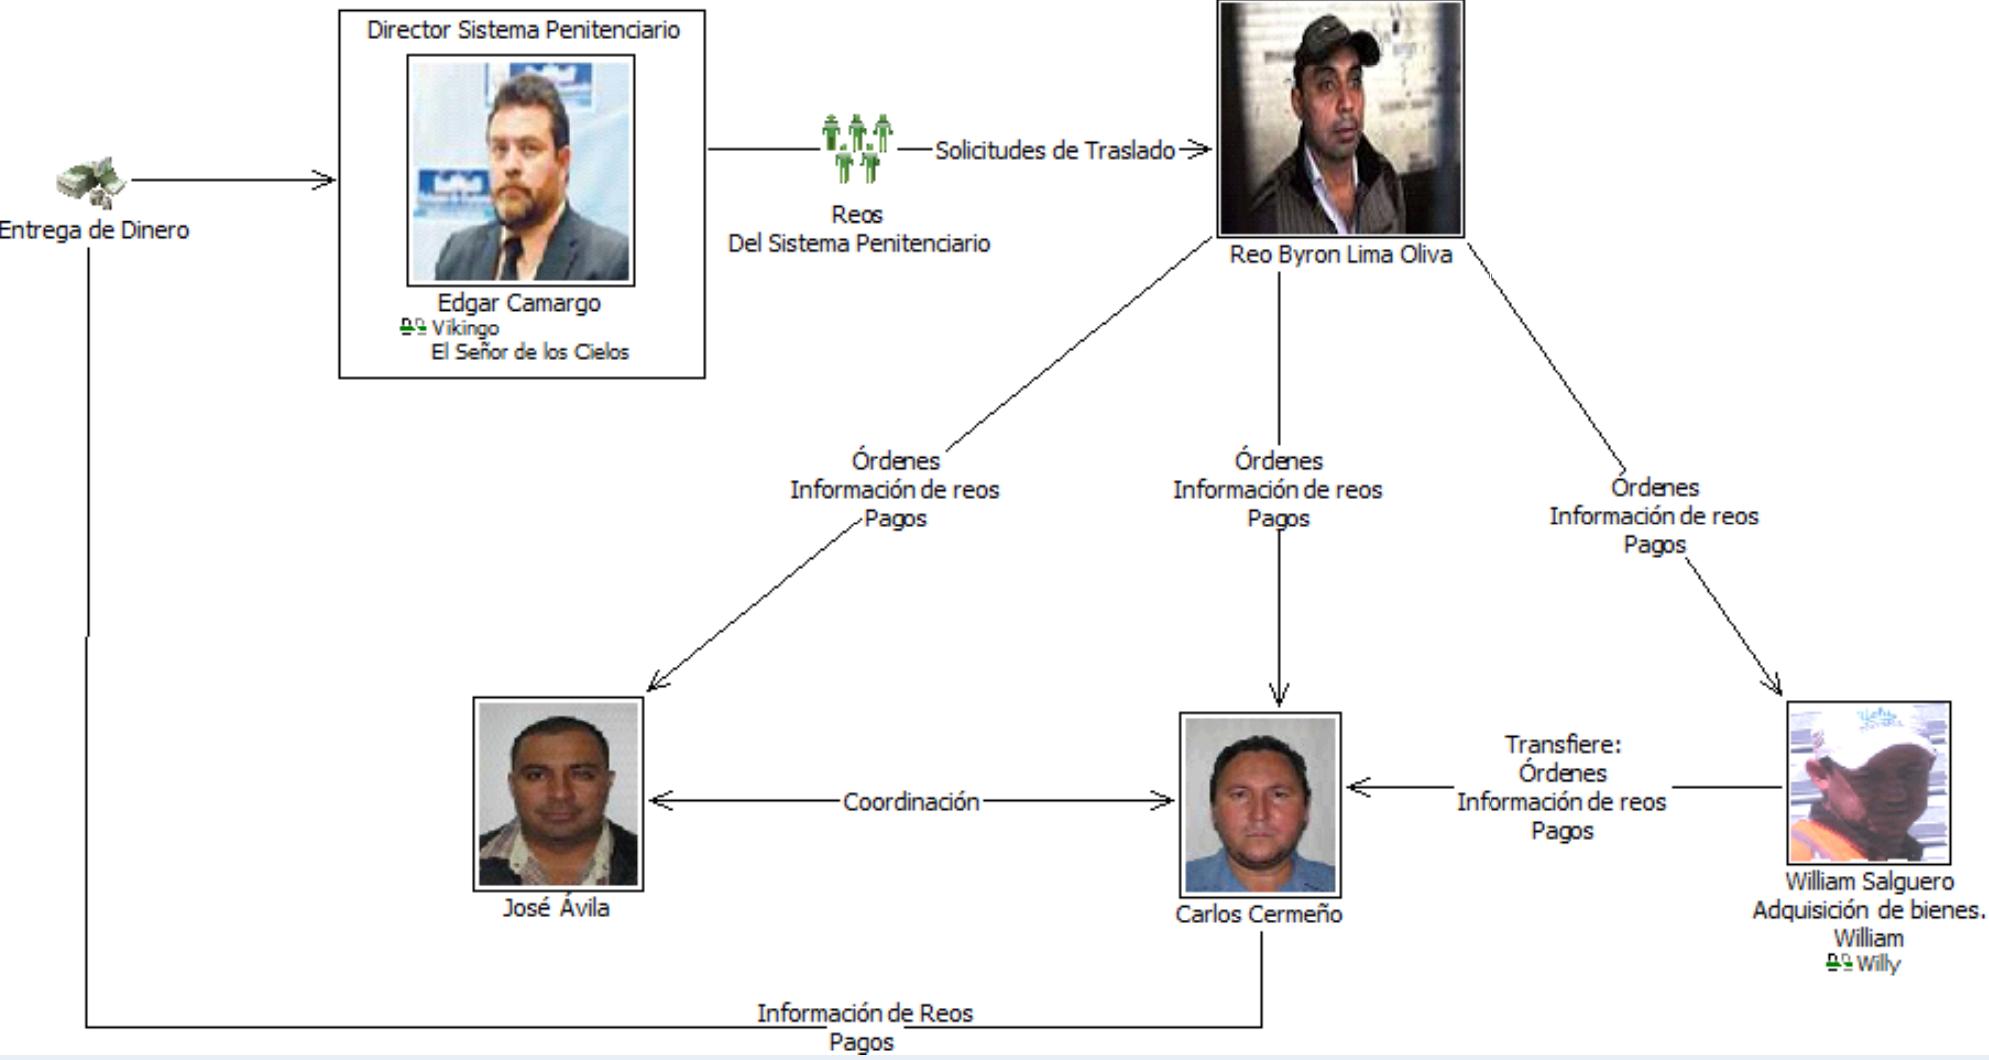 byron-lima-criminal-organization